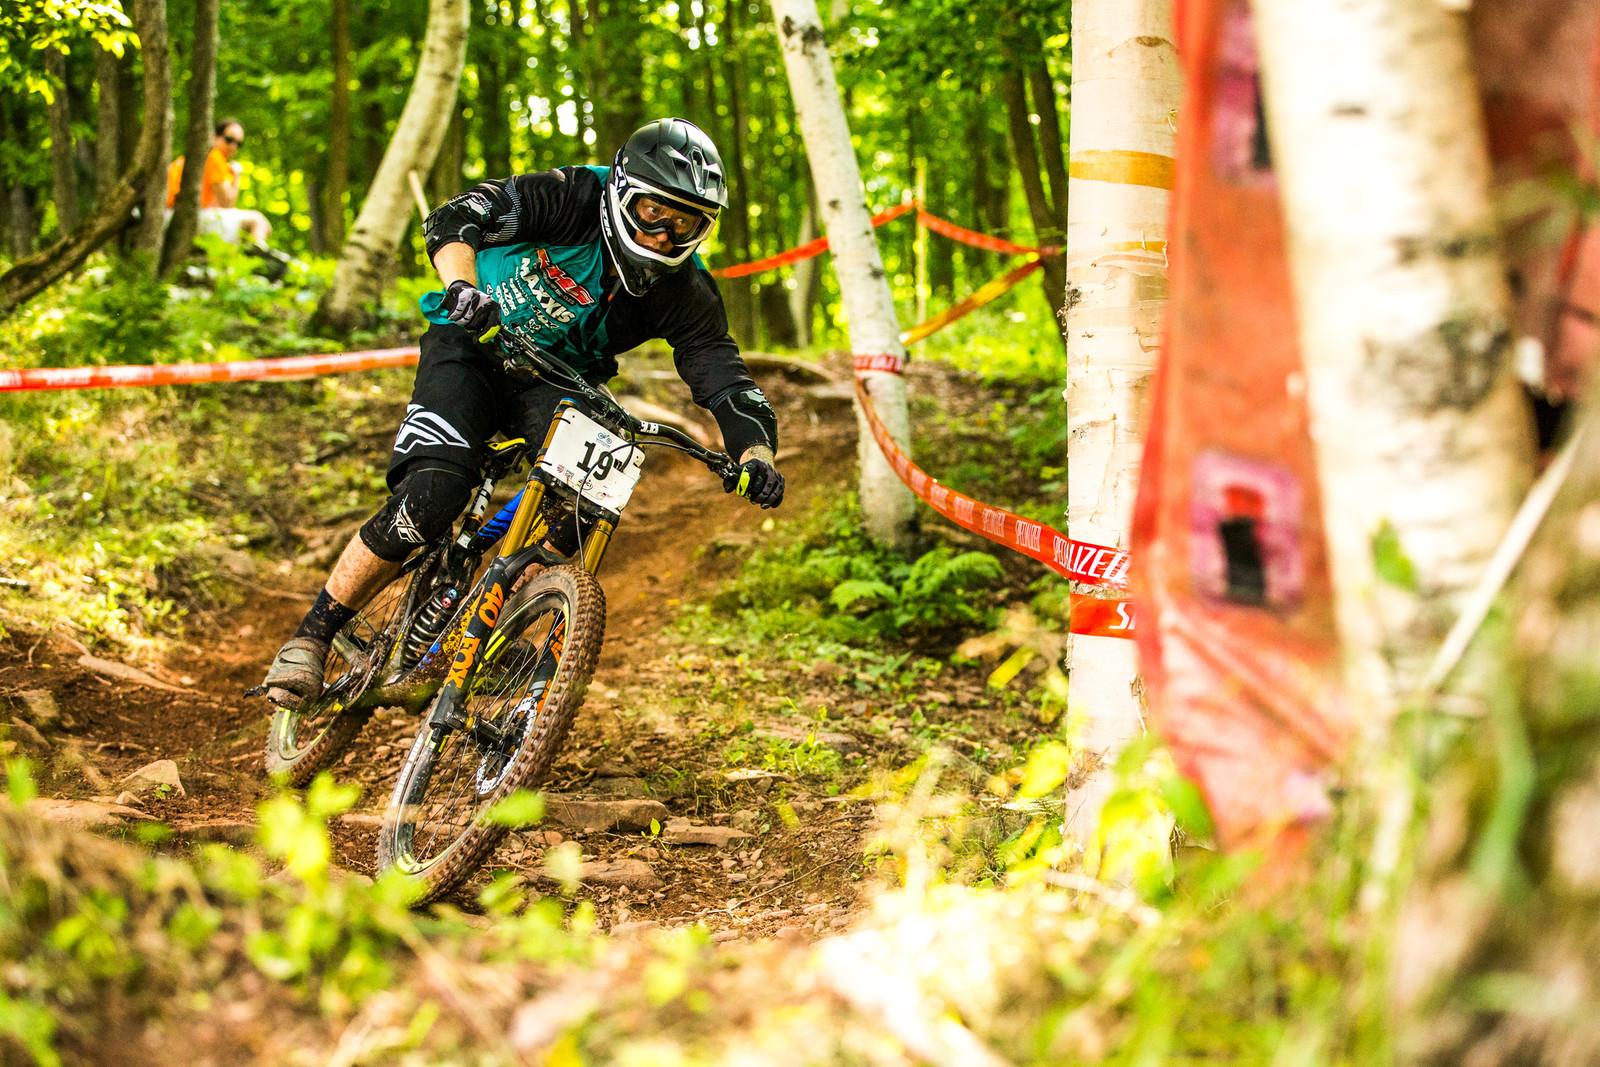 Logan Binggeli - RACE DAY GALLERY - 2017 Pro GRT, Windham, NY - Mountain Biking Pictures - Vital MTB